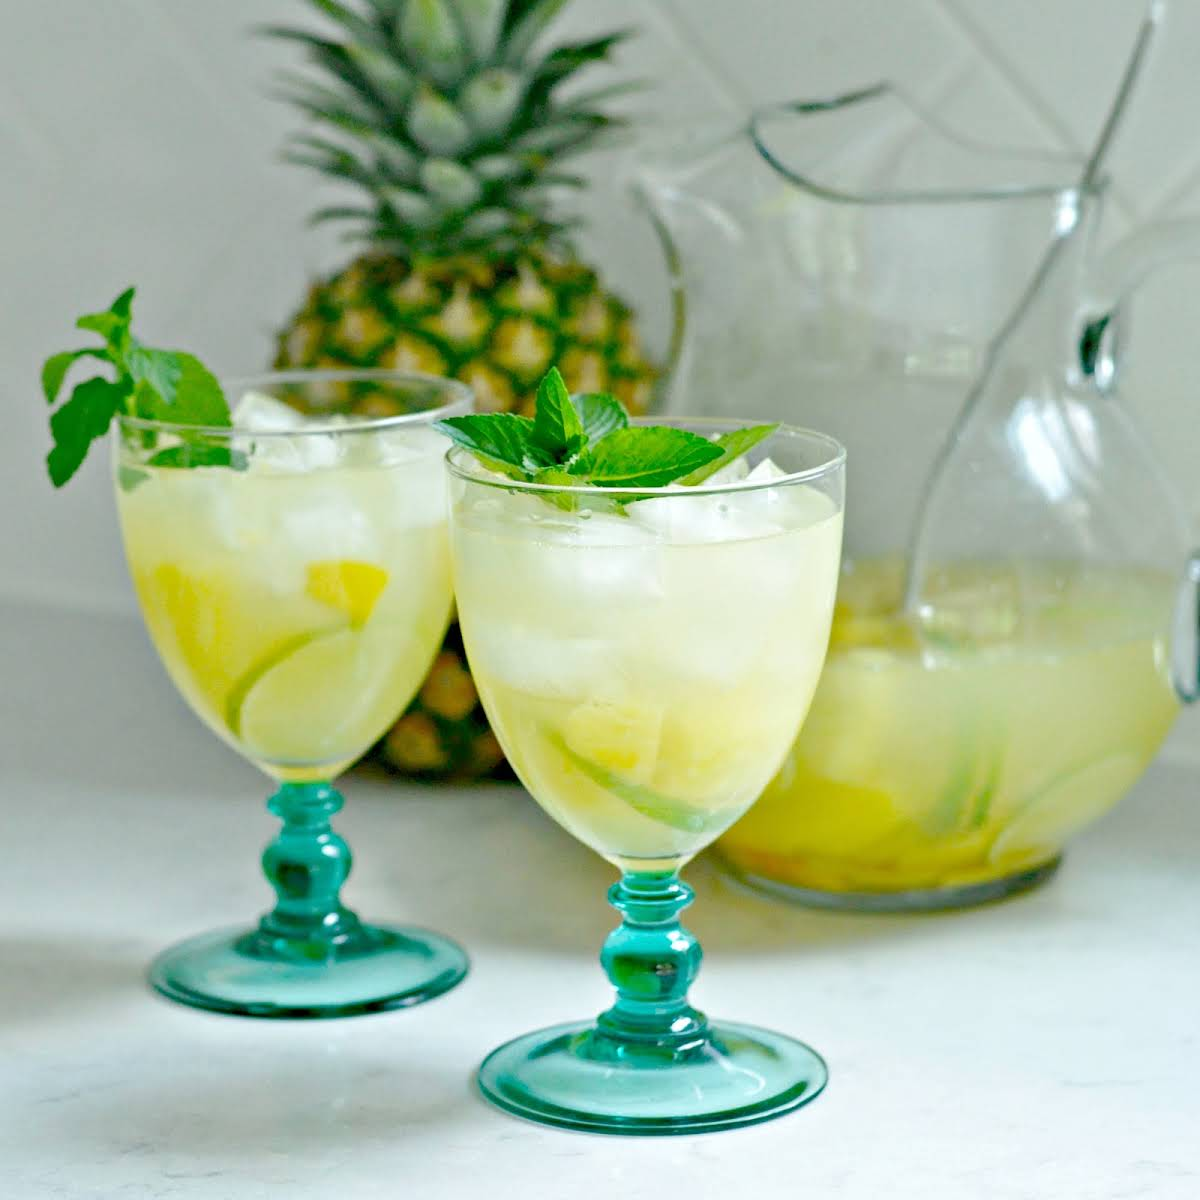 10 Best Vodka Orange Juice Pineapple Juice Recipes